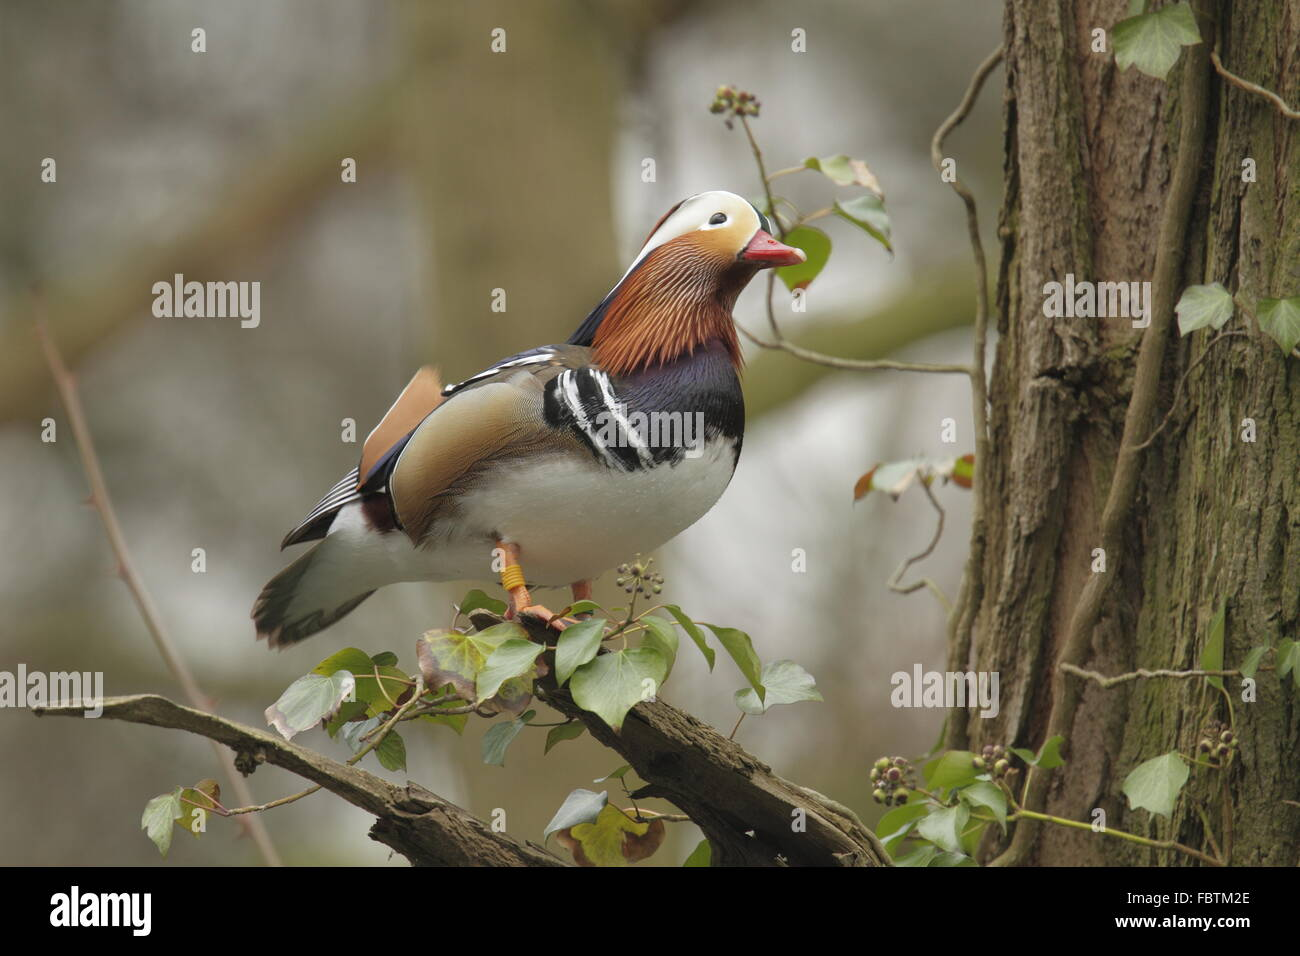 Mandarin, Aix galericulata, Photo Stock